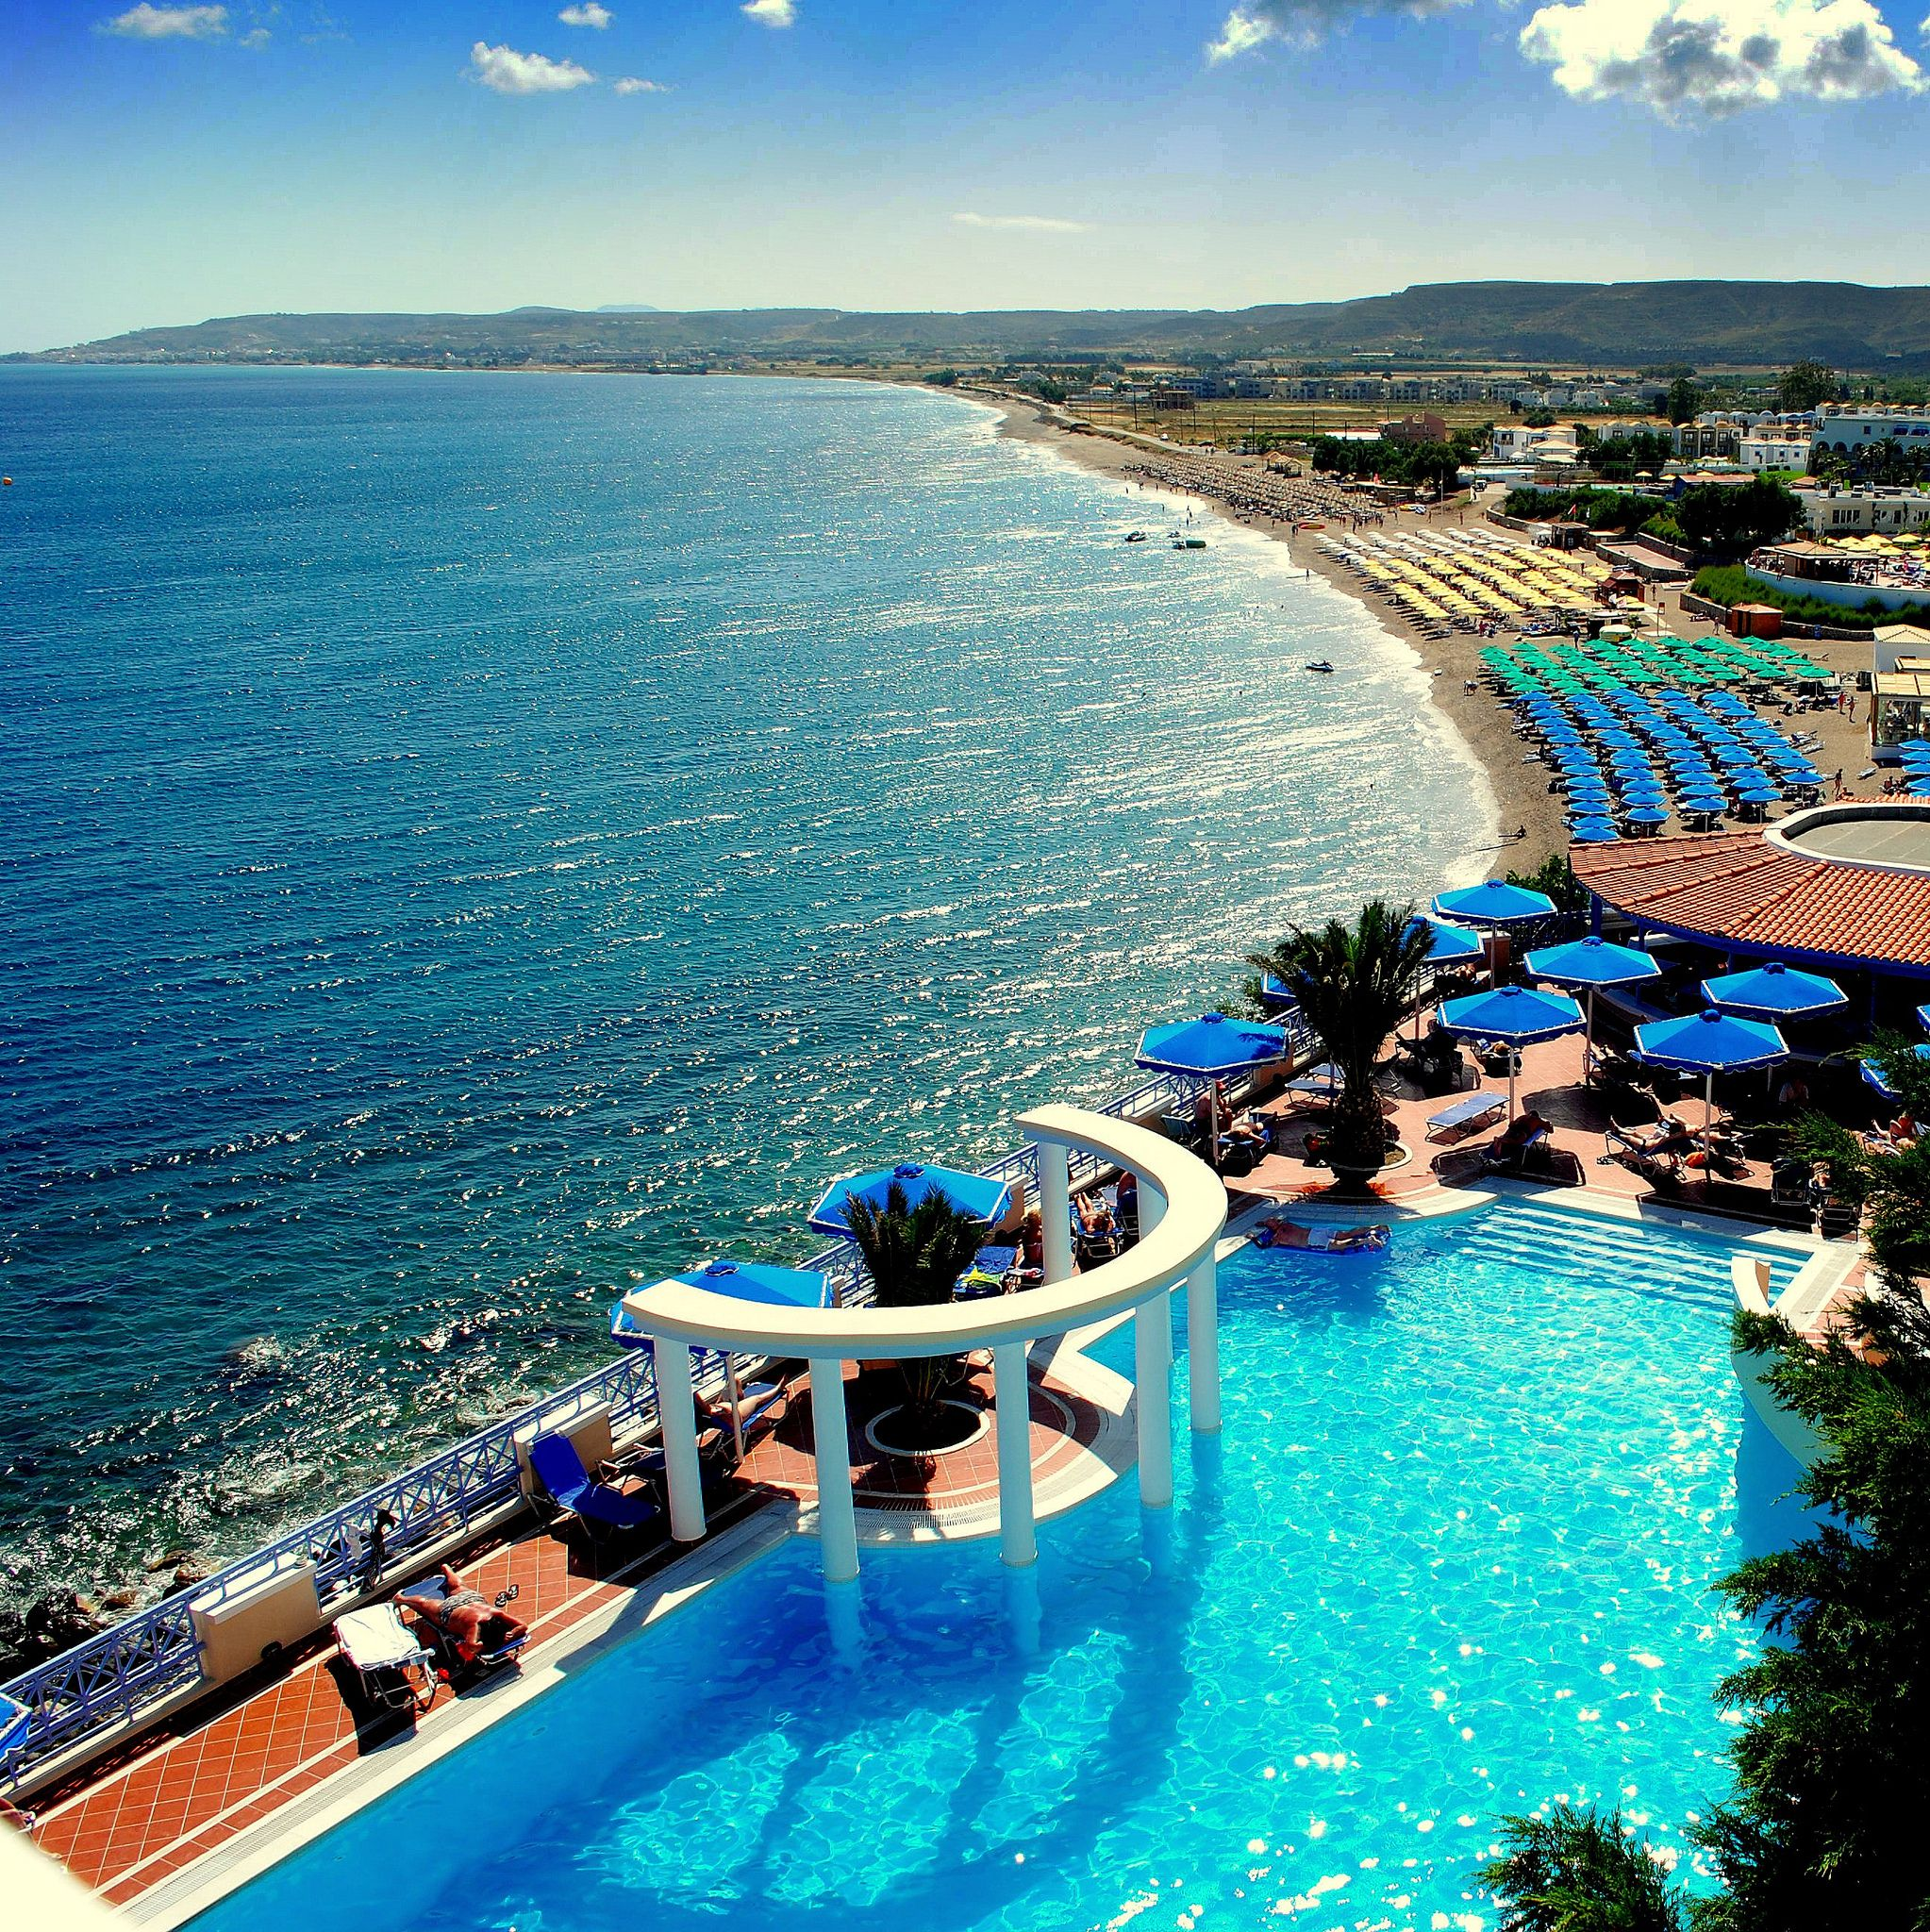 https://flic.kr/p/ckvJUf | summertime blue | the bay ofKardamena - island of Kos - Greece   bleu estival - dans la baie de Kardamena  - 'île de Kos - Grèce